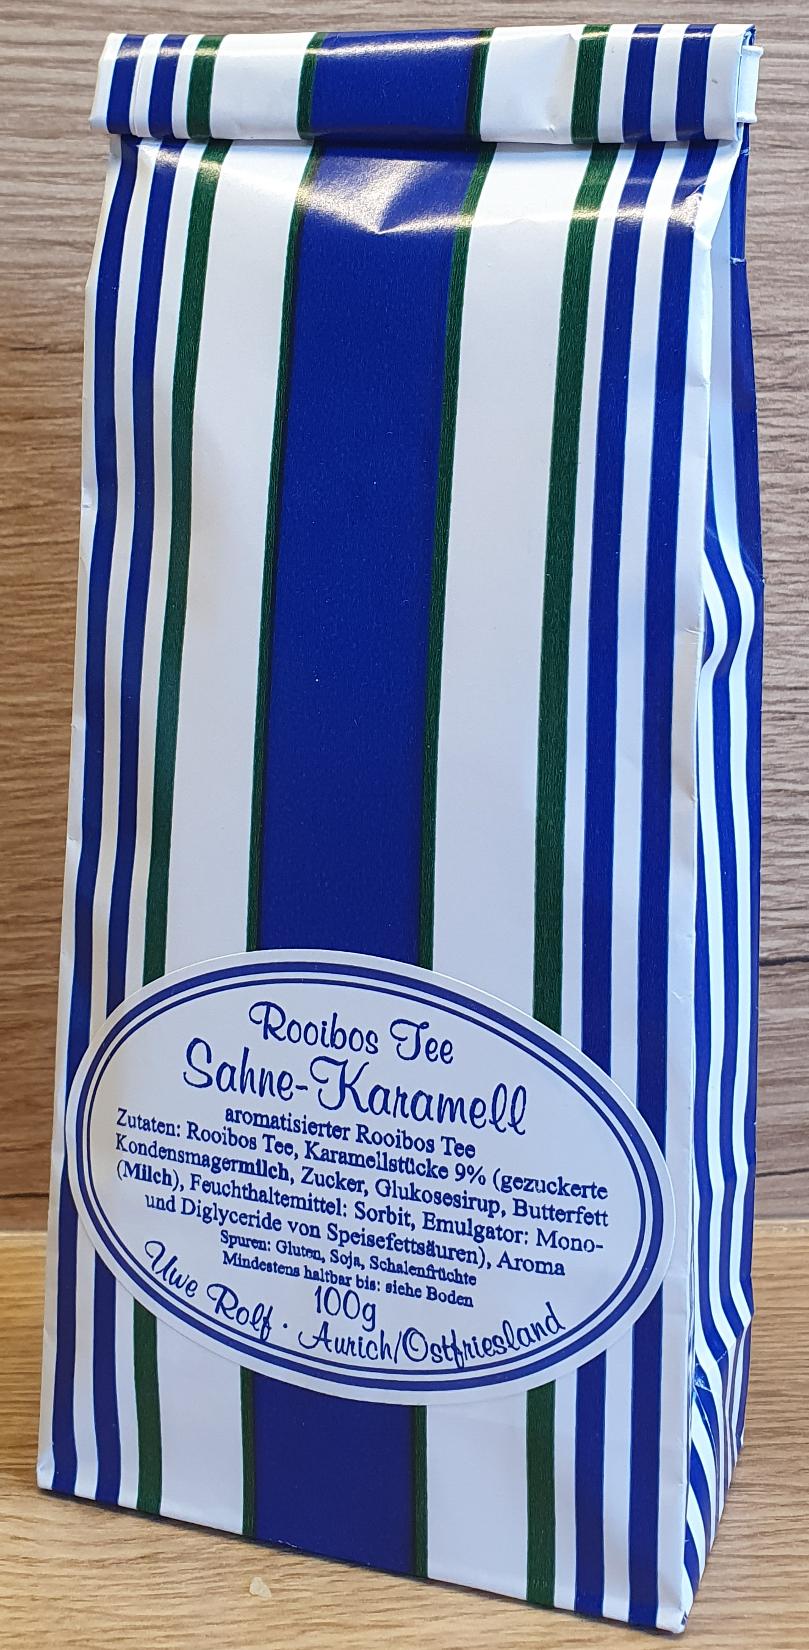 Rooibos Sahne Karamell